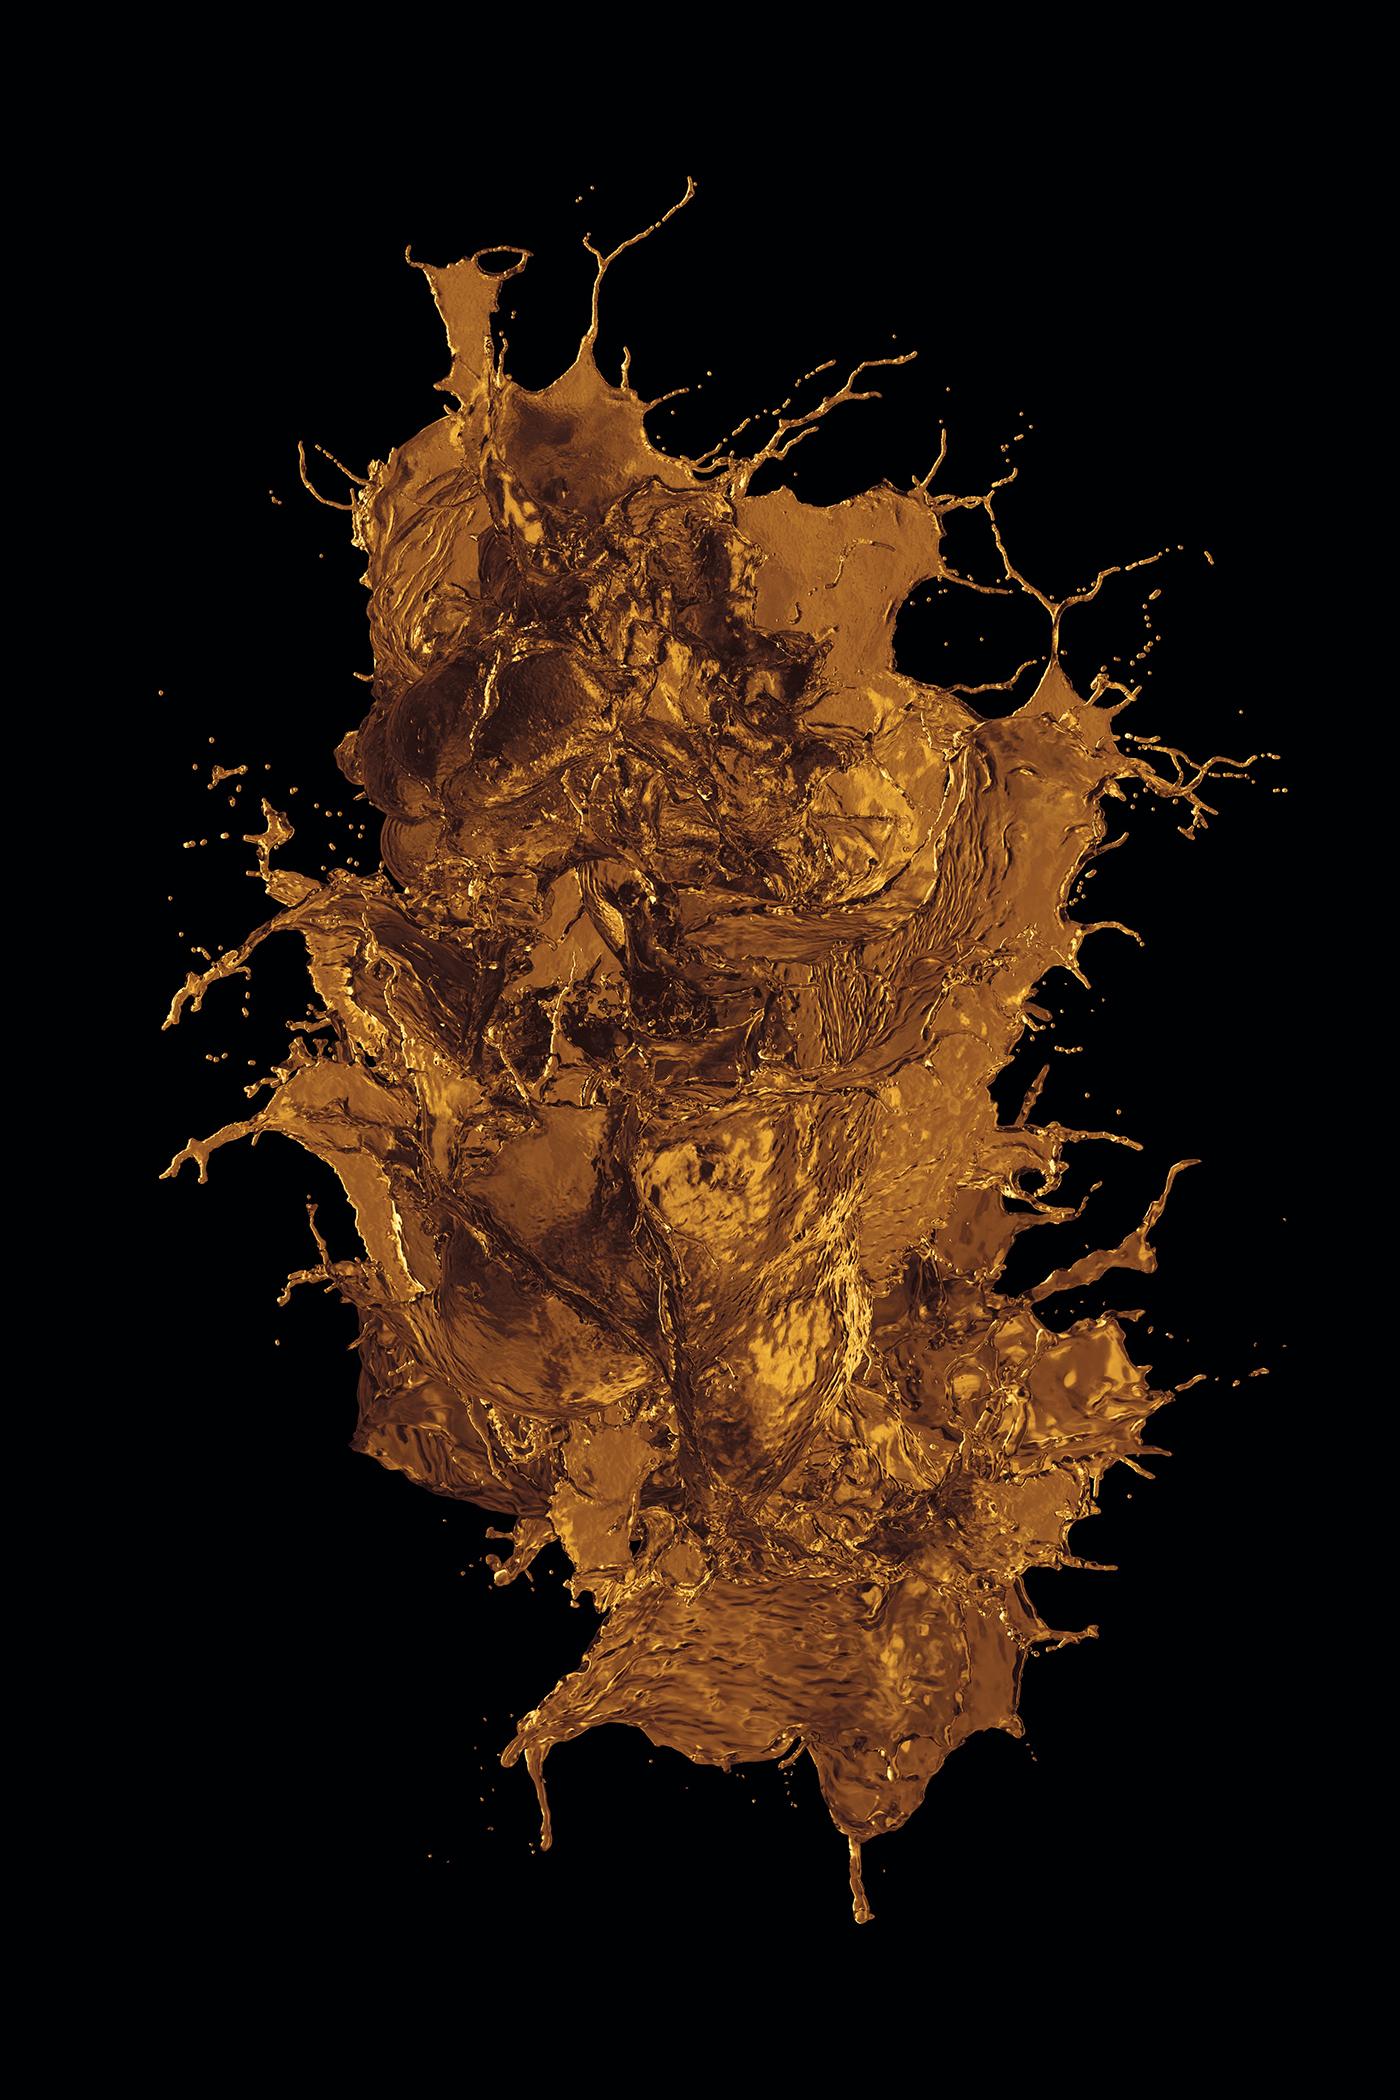 Liquid gold spilled on a black background.